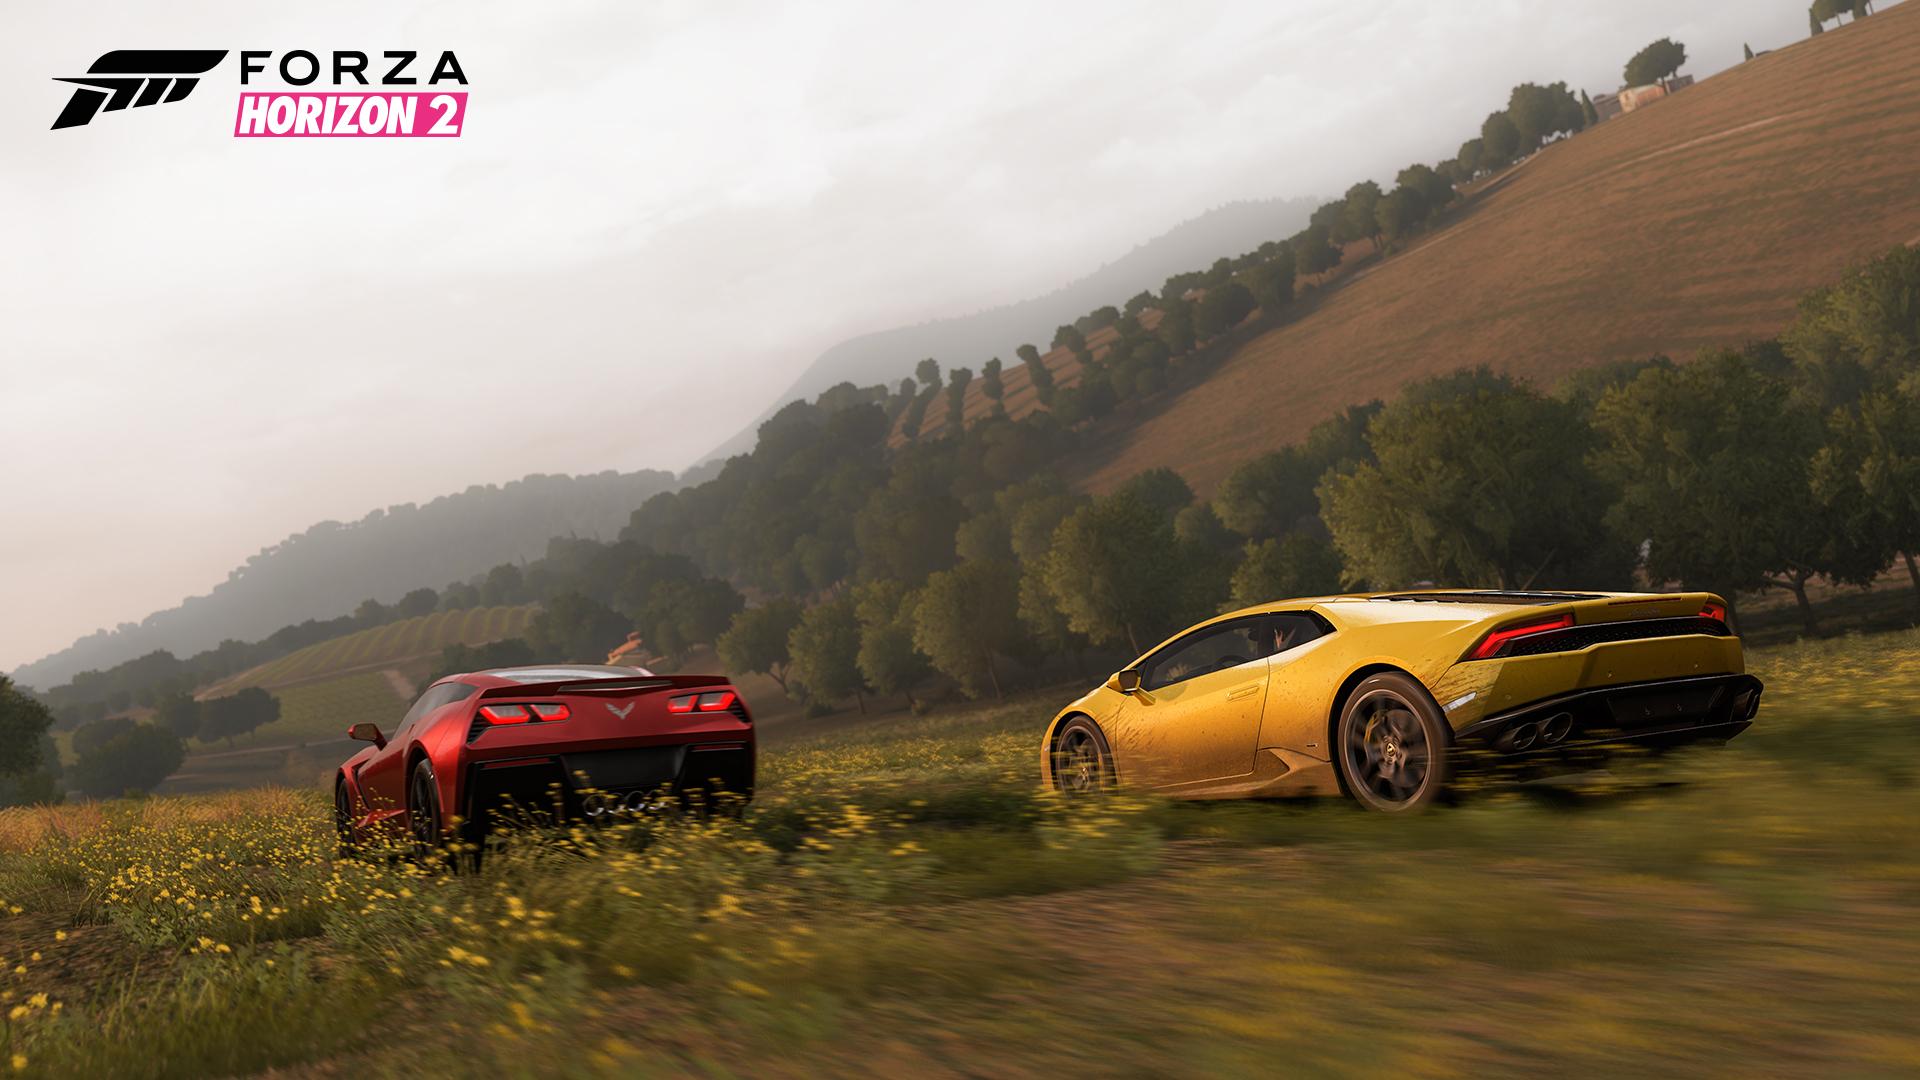 Official Forza Horizon 2 Xbox Lobby Car Club